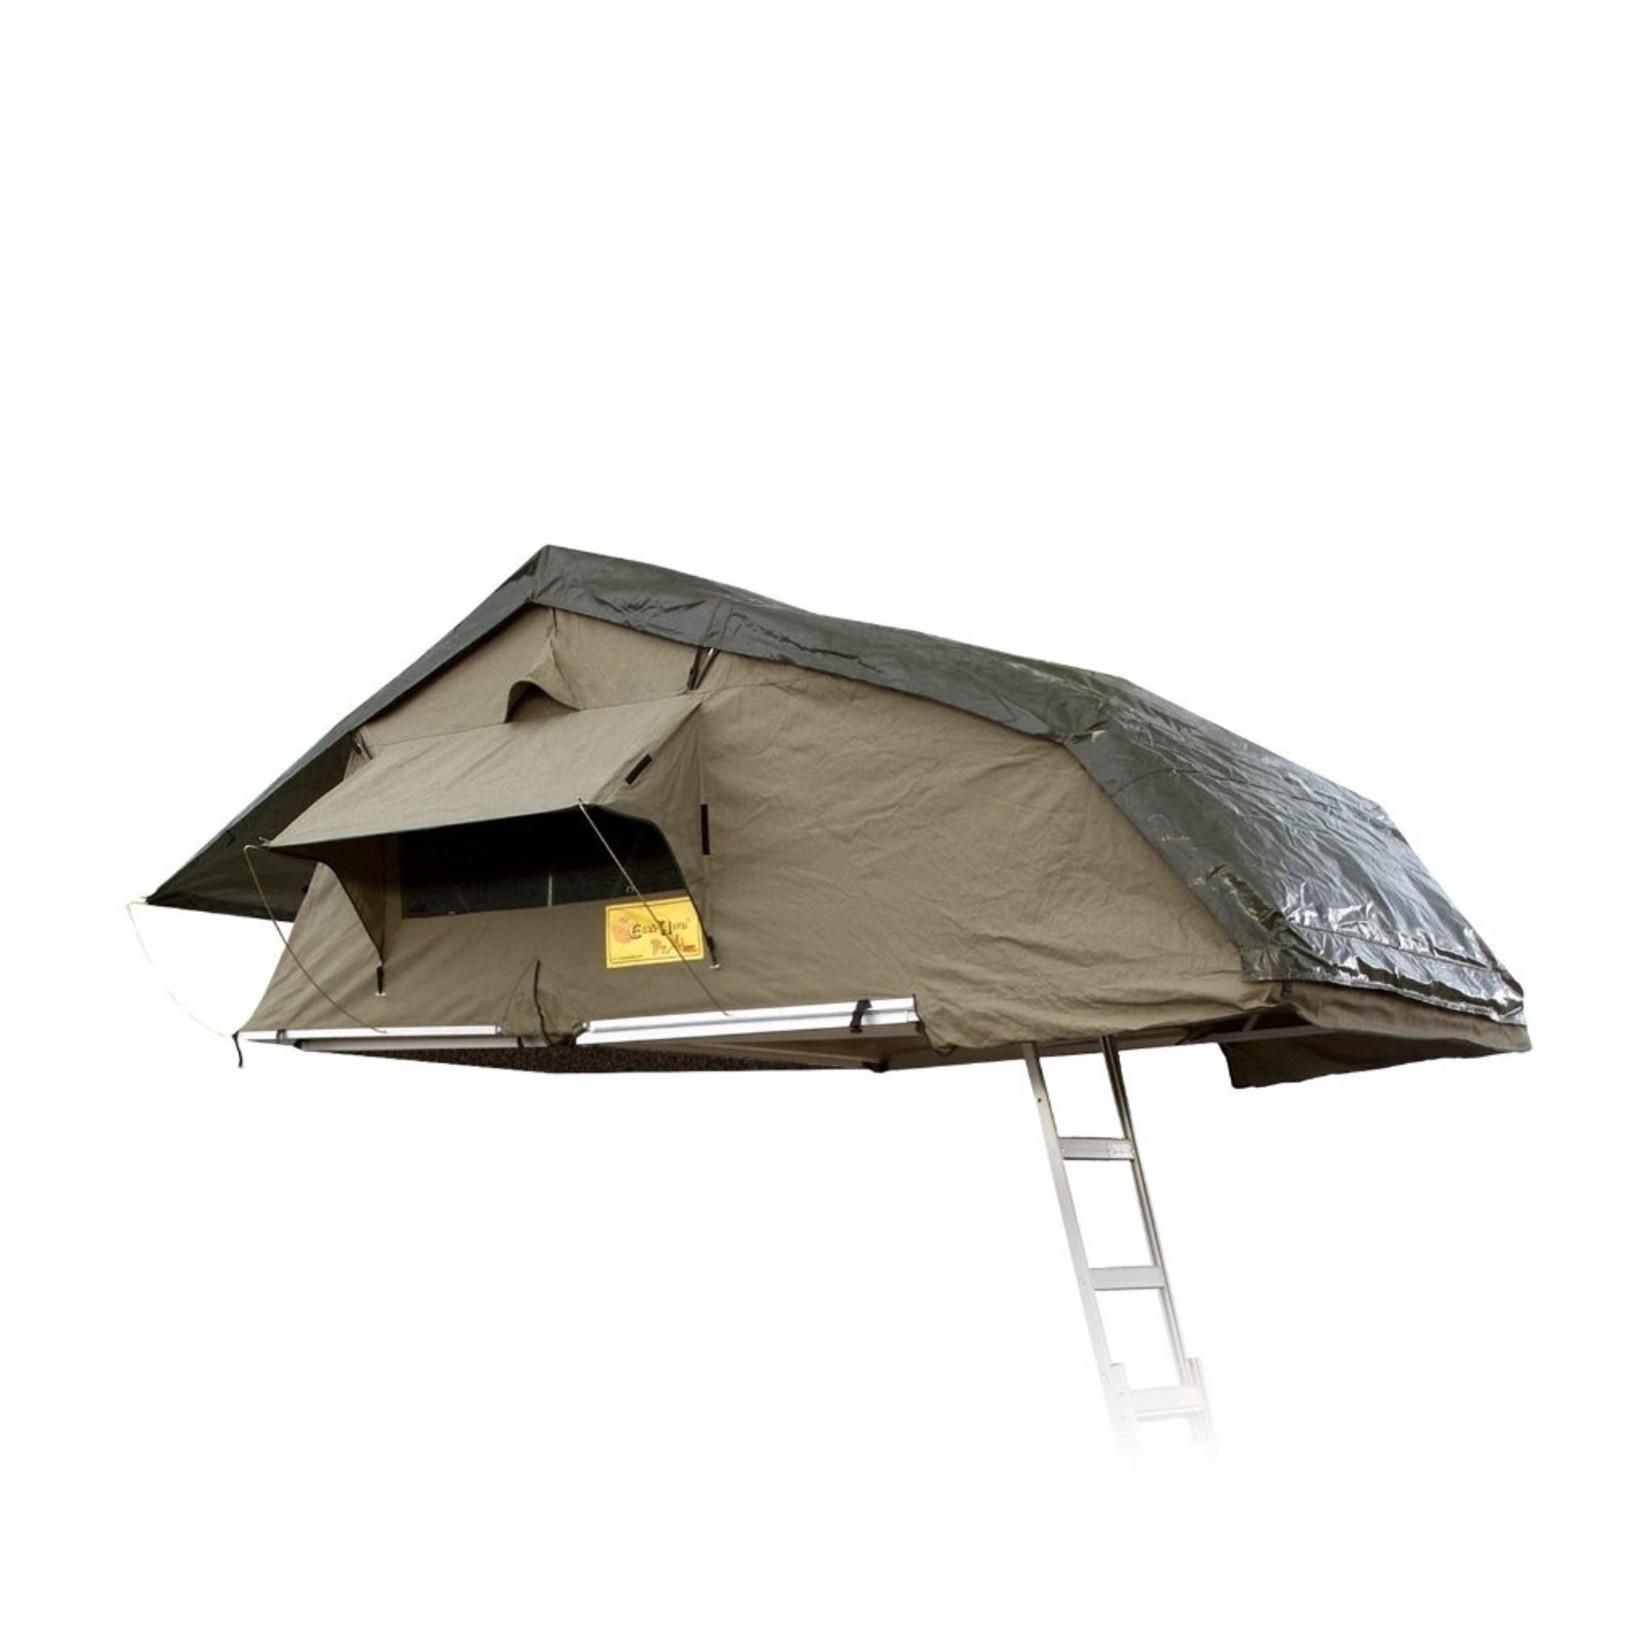 Eezi-Awn Eezi-Awn XKLUSIV Roof Top Tent